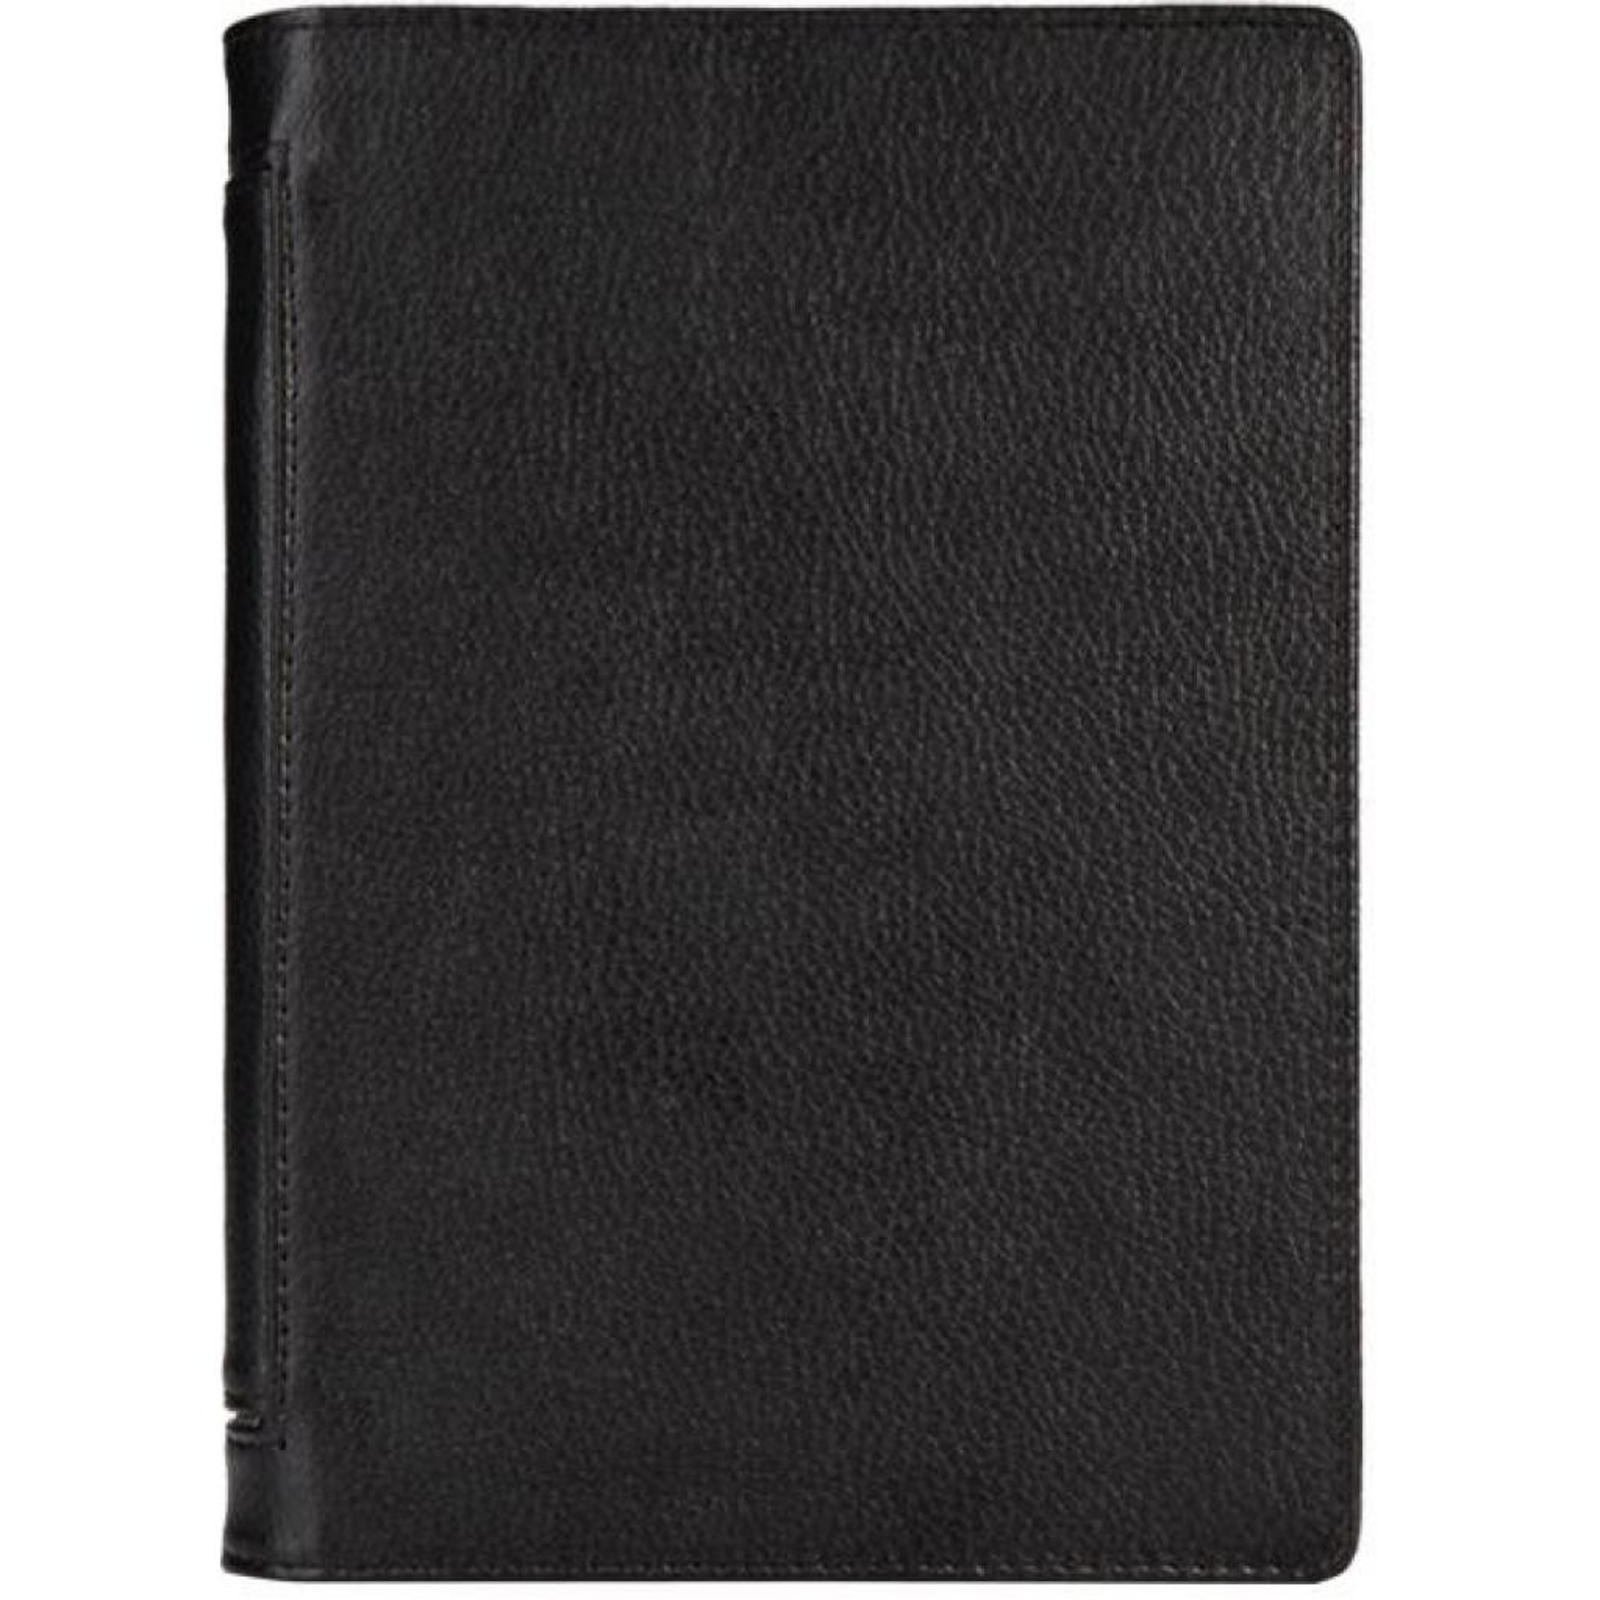 Чехол для планшета AirOn для Lenovo YOGA Tablet 3 8'' black (4822352770303)